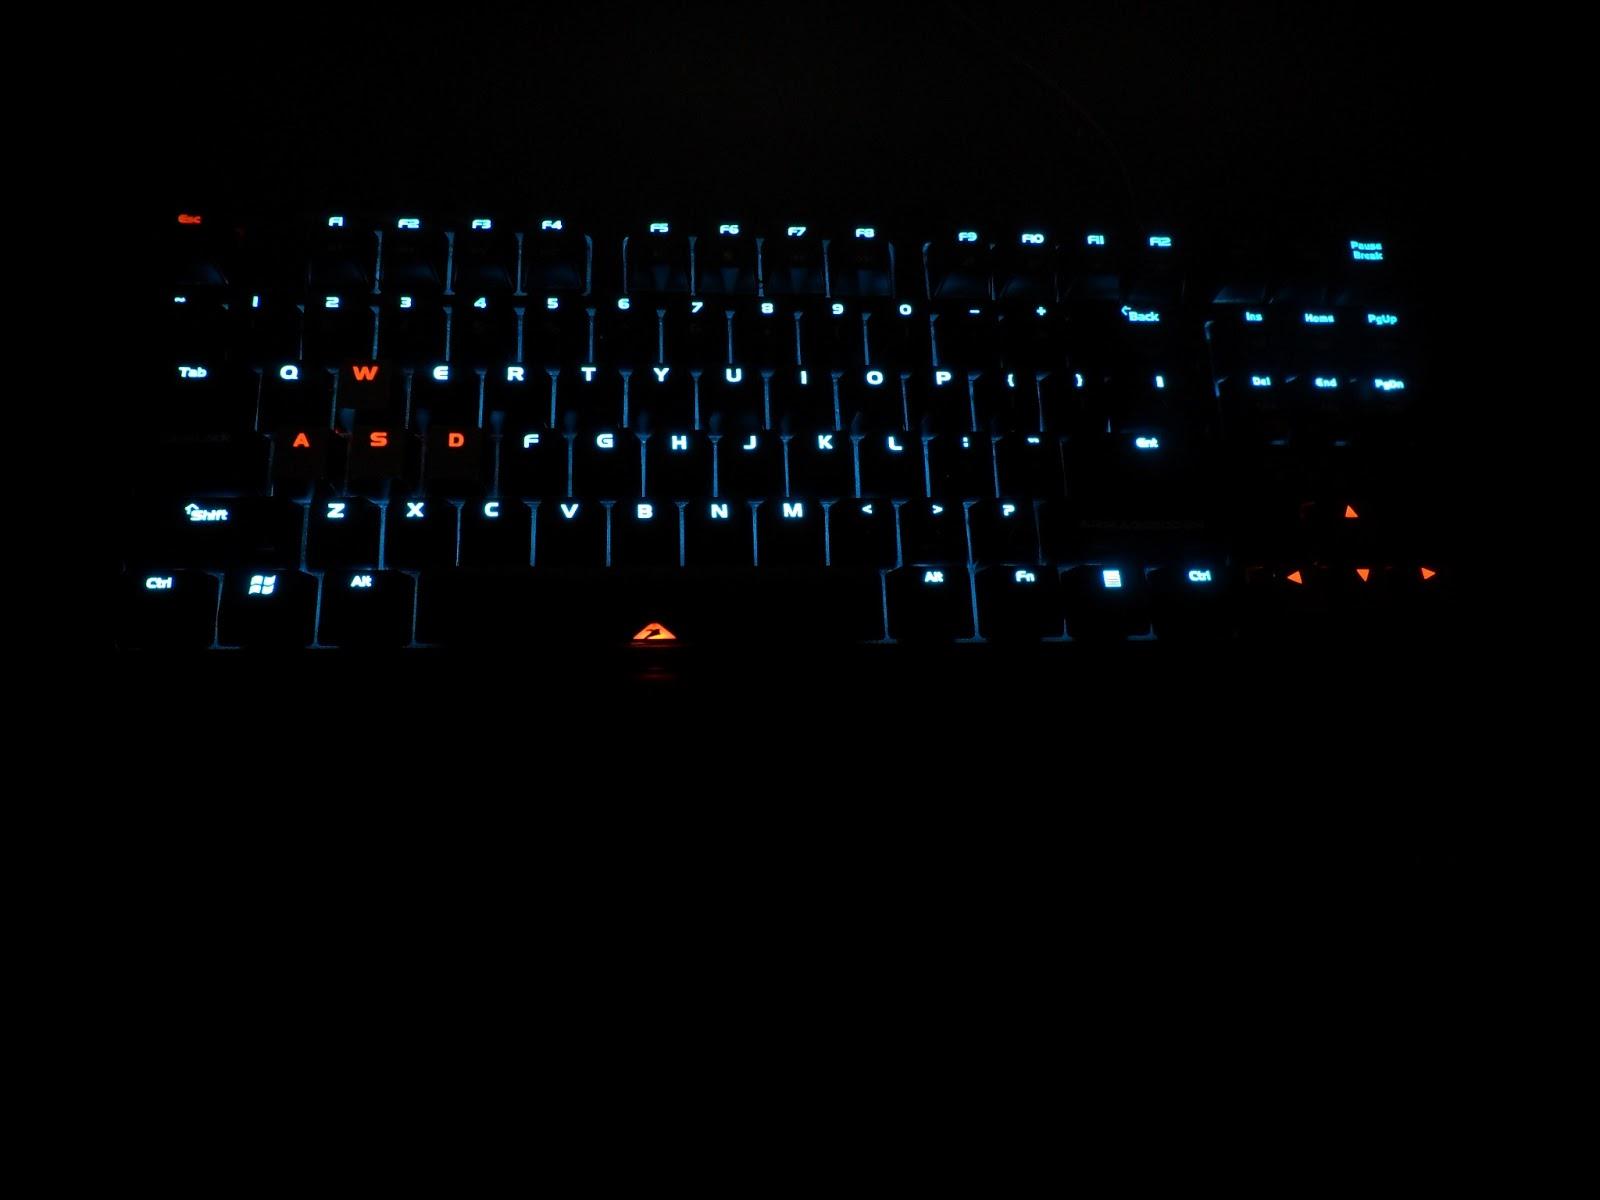 Unboxing & Review: Armaggeddon Black Hornet MKA-3 Mechanical Gaming Keyboard 14